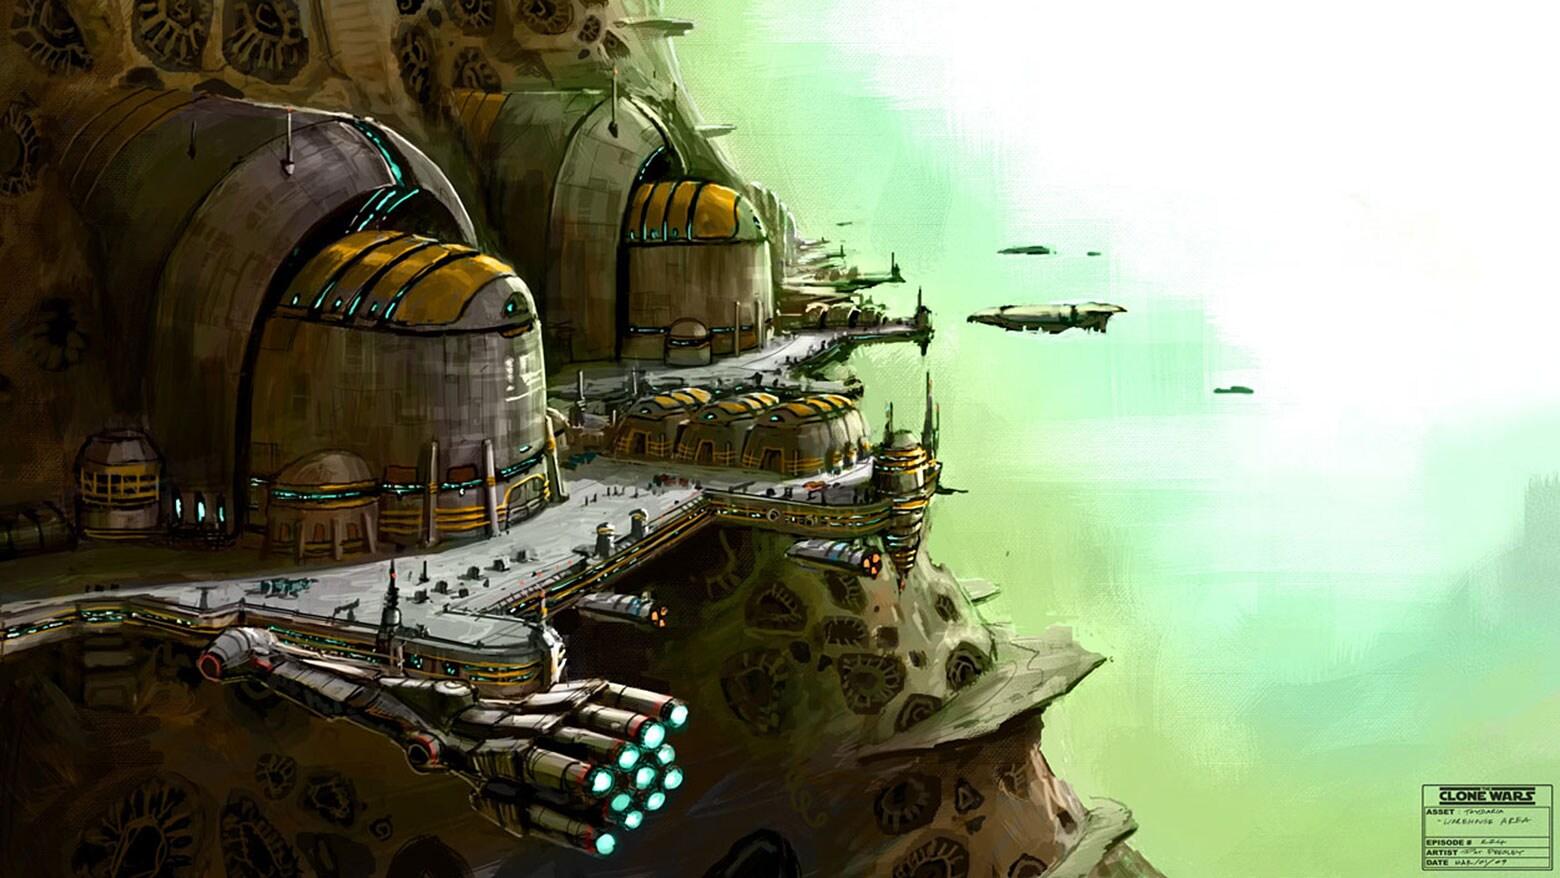 Star Wars Concept Art Gallery